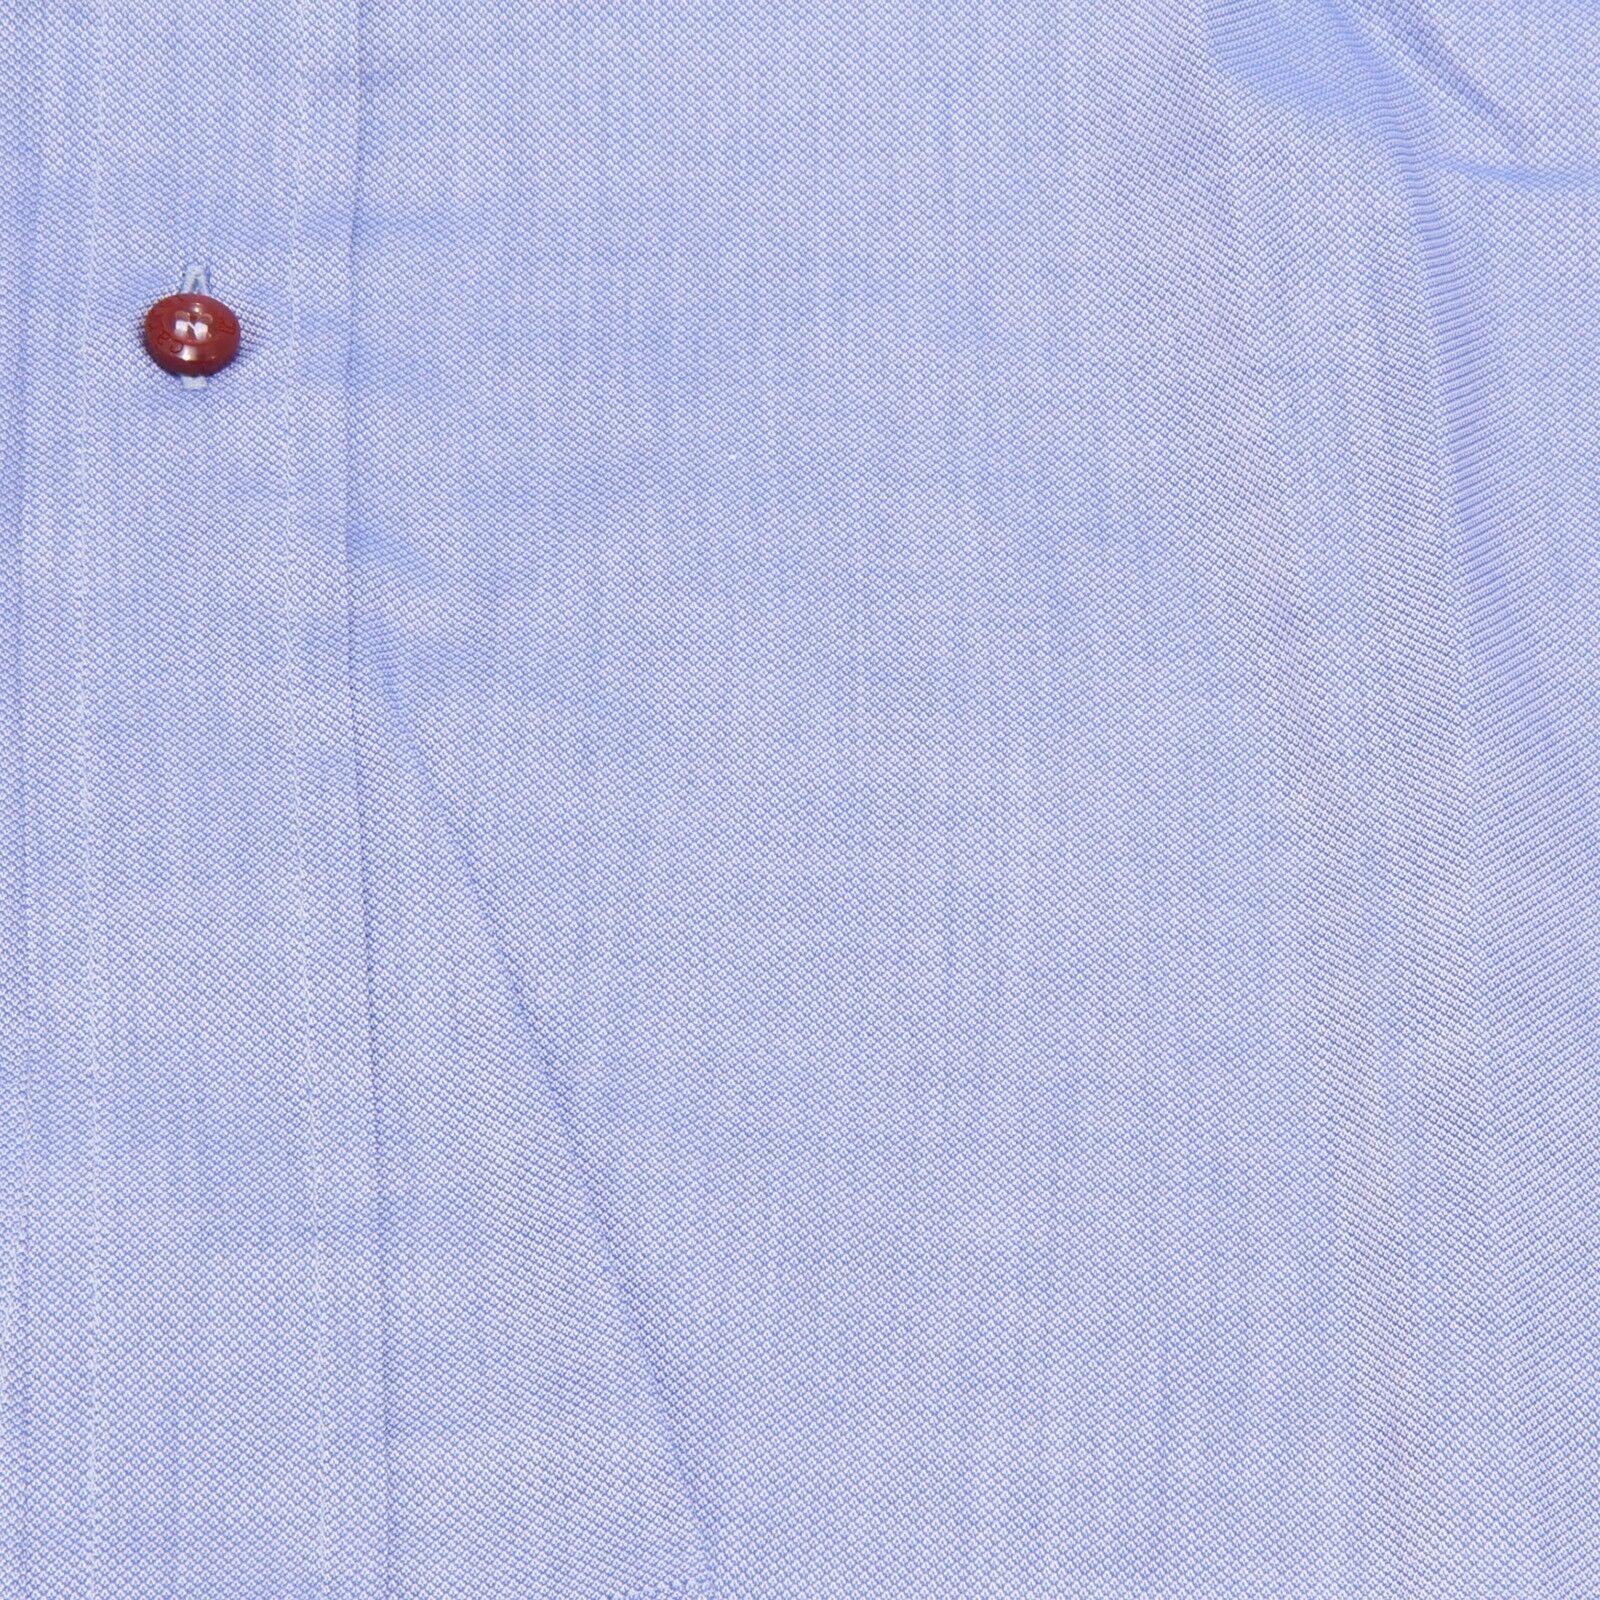 2698P camicia uomo CARREL azzurra manica corta shirt Uomo Uomo Uomo sleeveless 504965